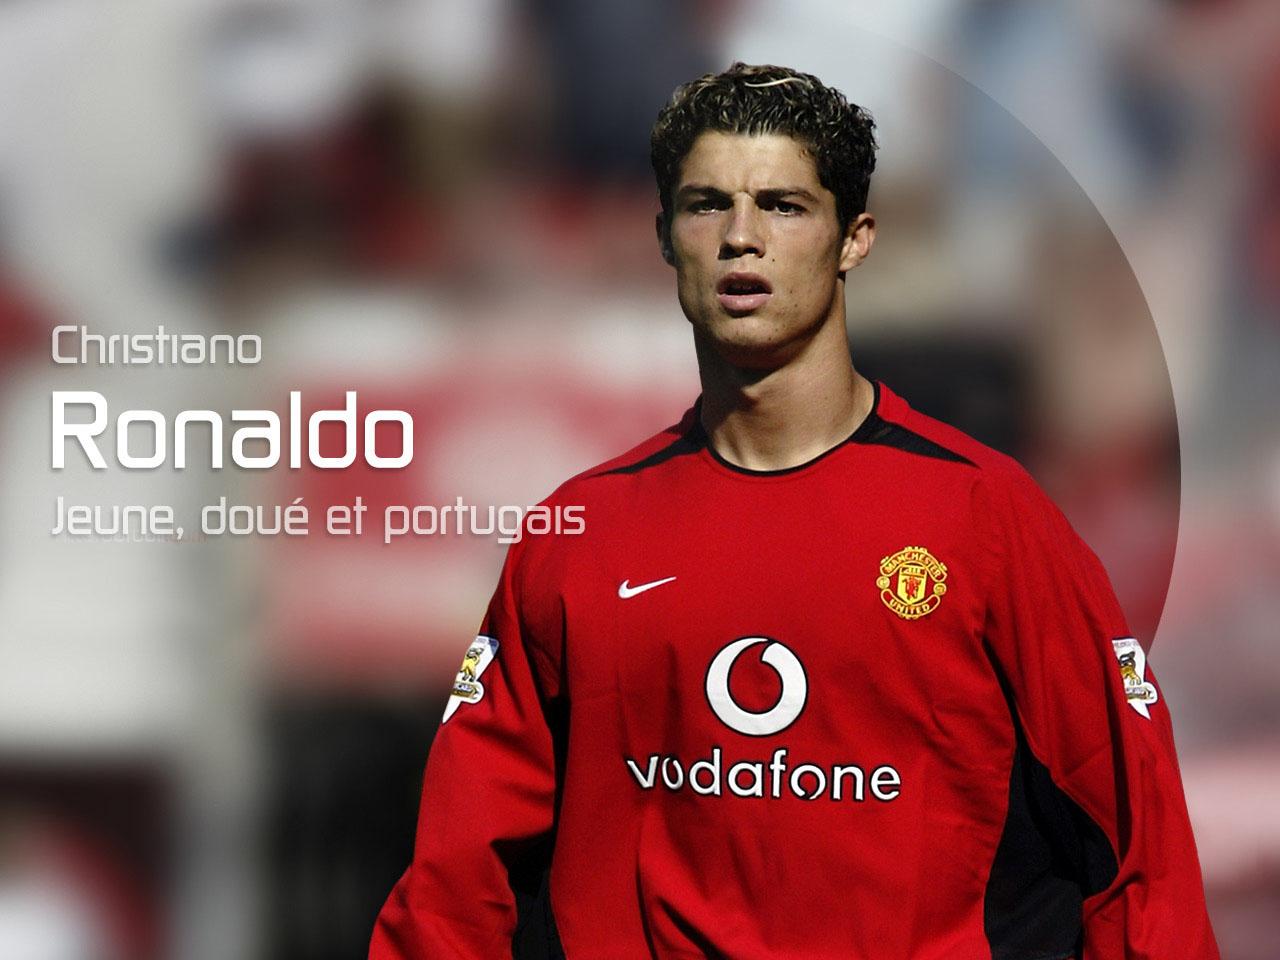 cristiano-ronaldo-manchester-united-sport-jpg-×-wallpaper-wp3004624